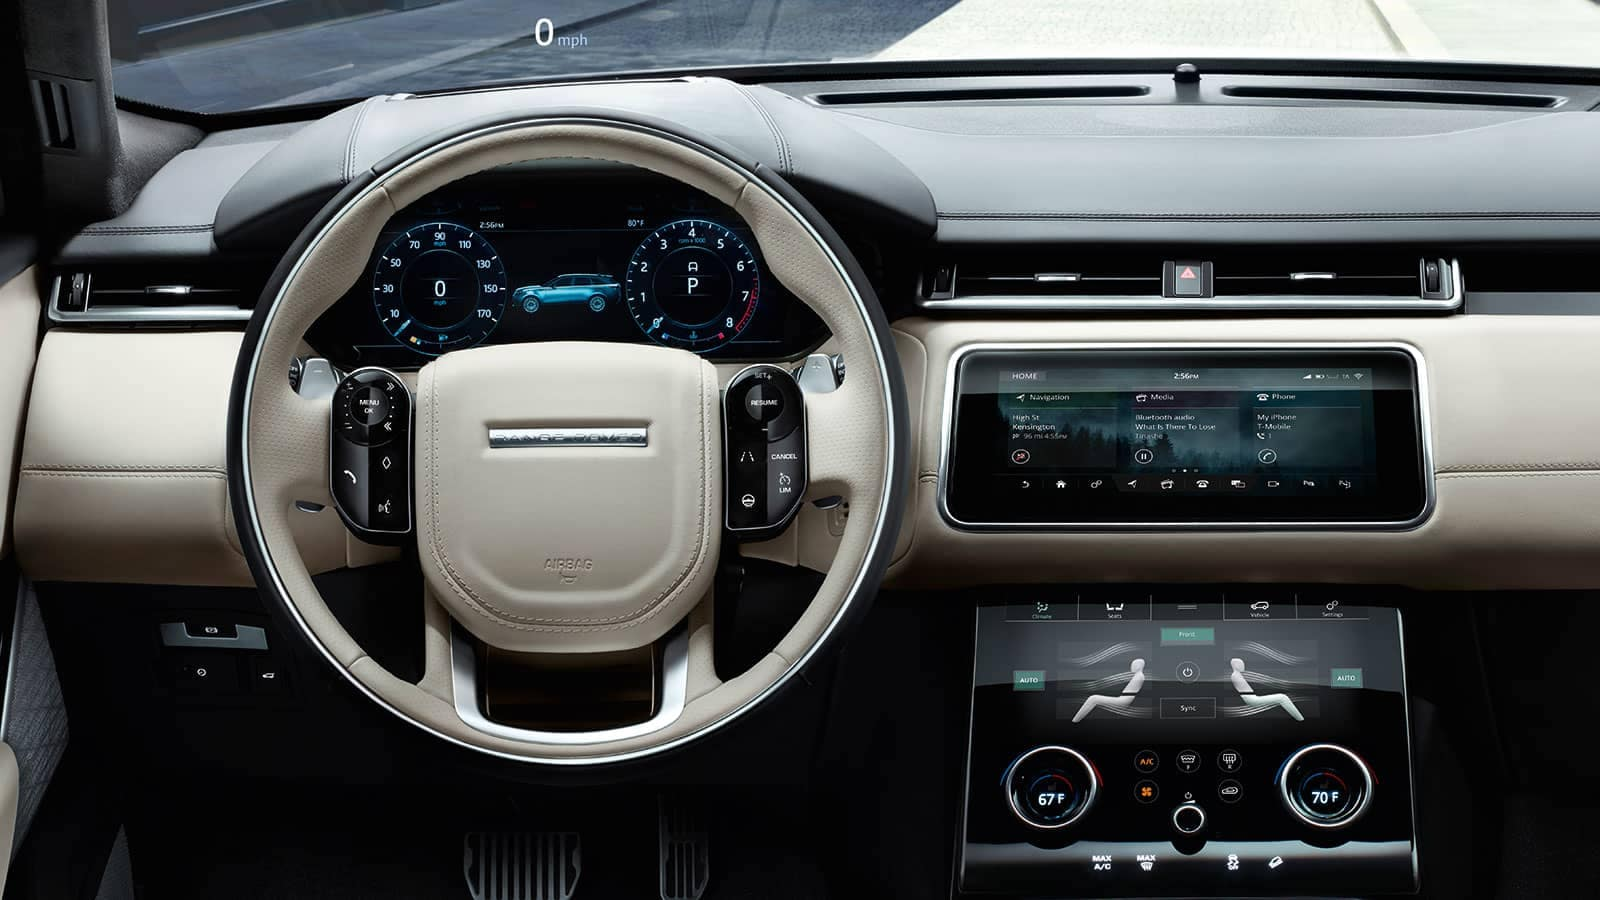 2019 Land Rover Range Rover Velar Dashboard